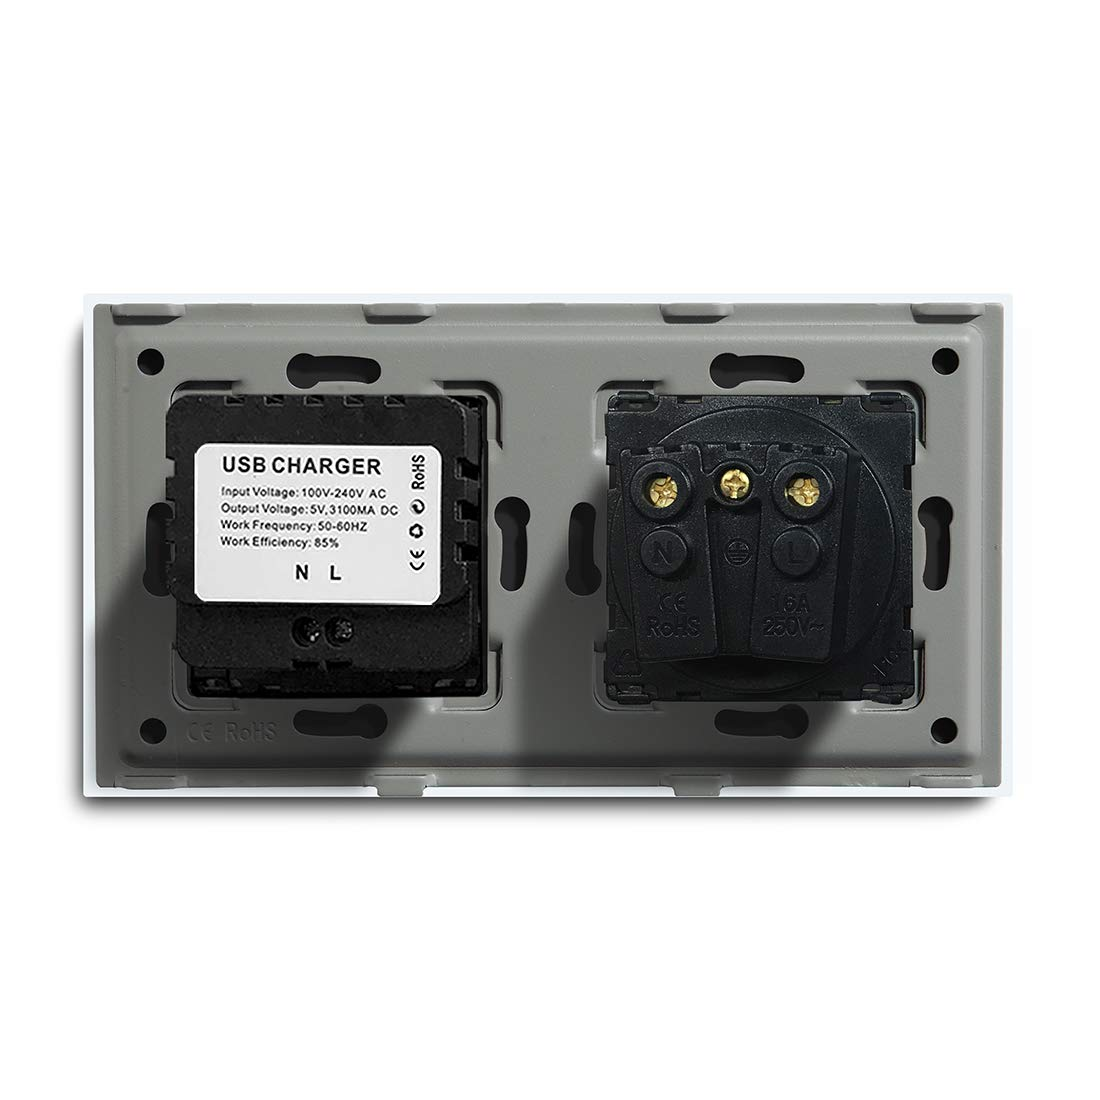 BSEED Glass Panel 16A PC Extended CAT 5E y tomas USB 100-220 V AC tomas de carga Negro